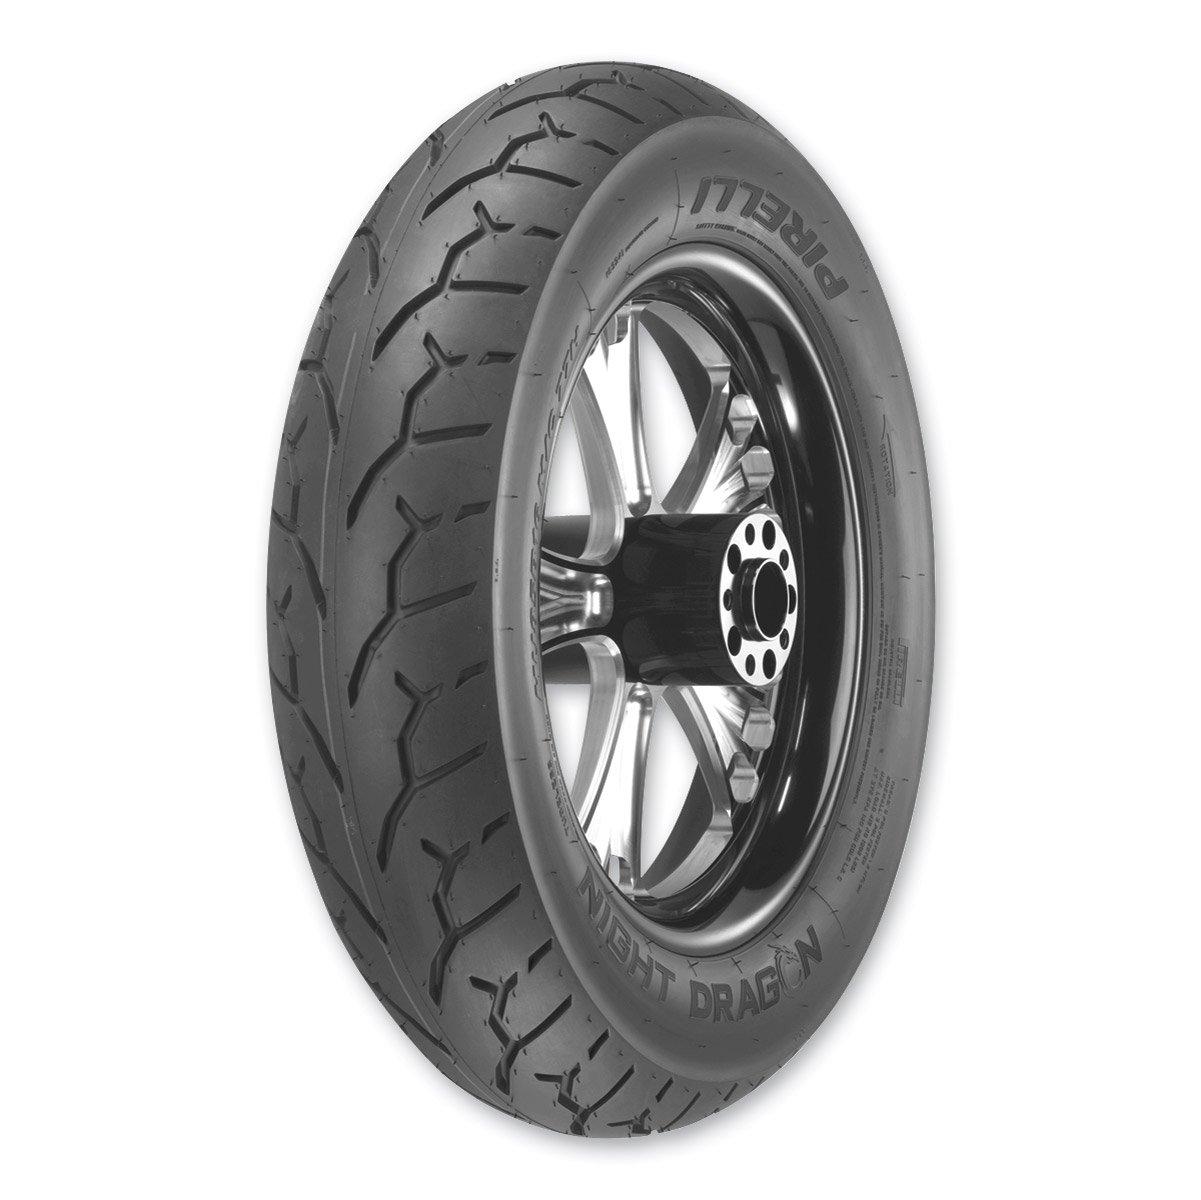 100//90-19F Pirelli Night Dragon Front Tire